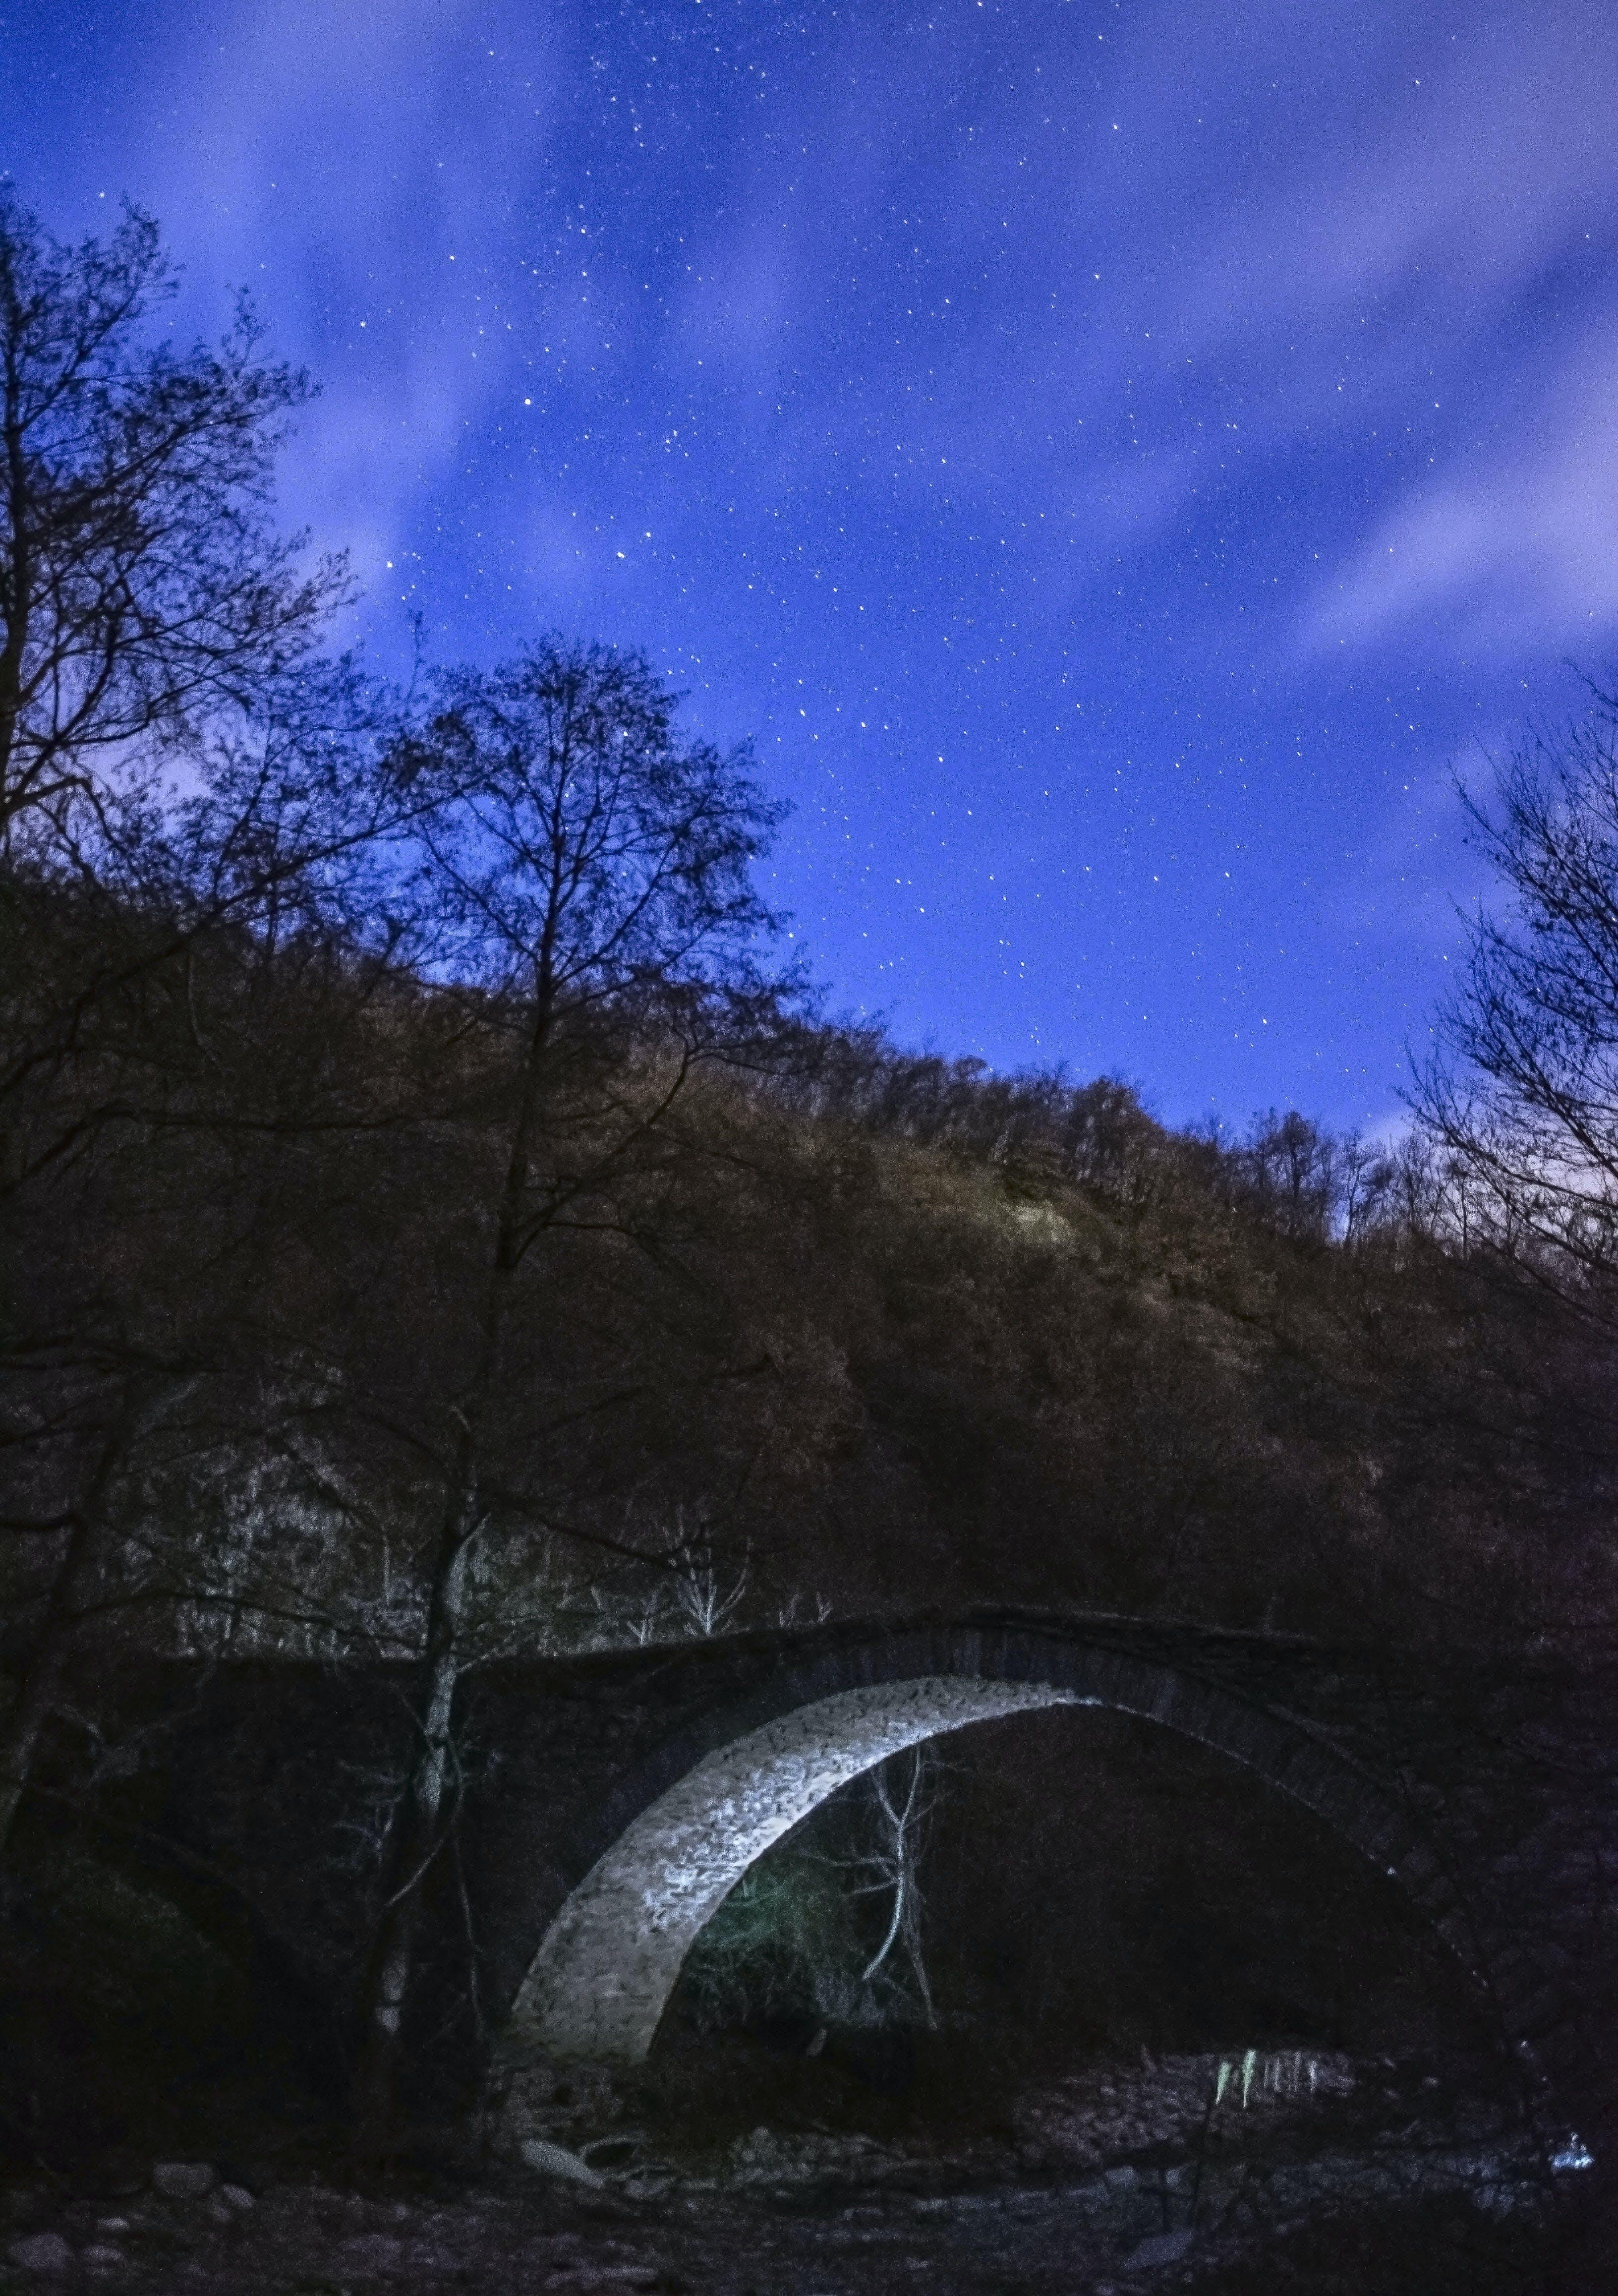 Gray Concrete Bridge Near Trees